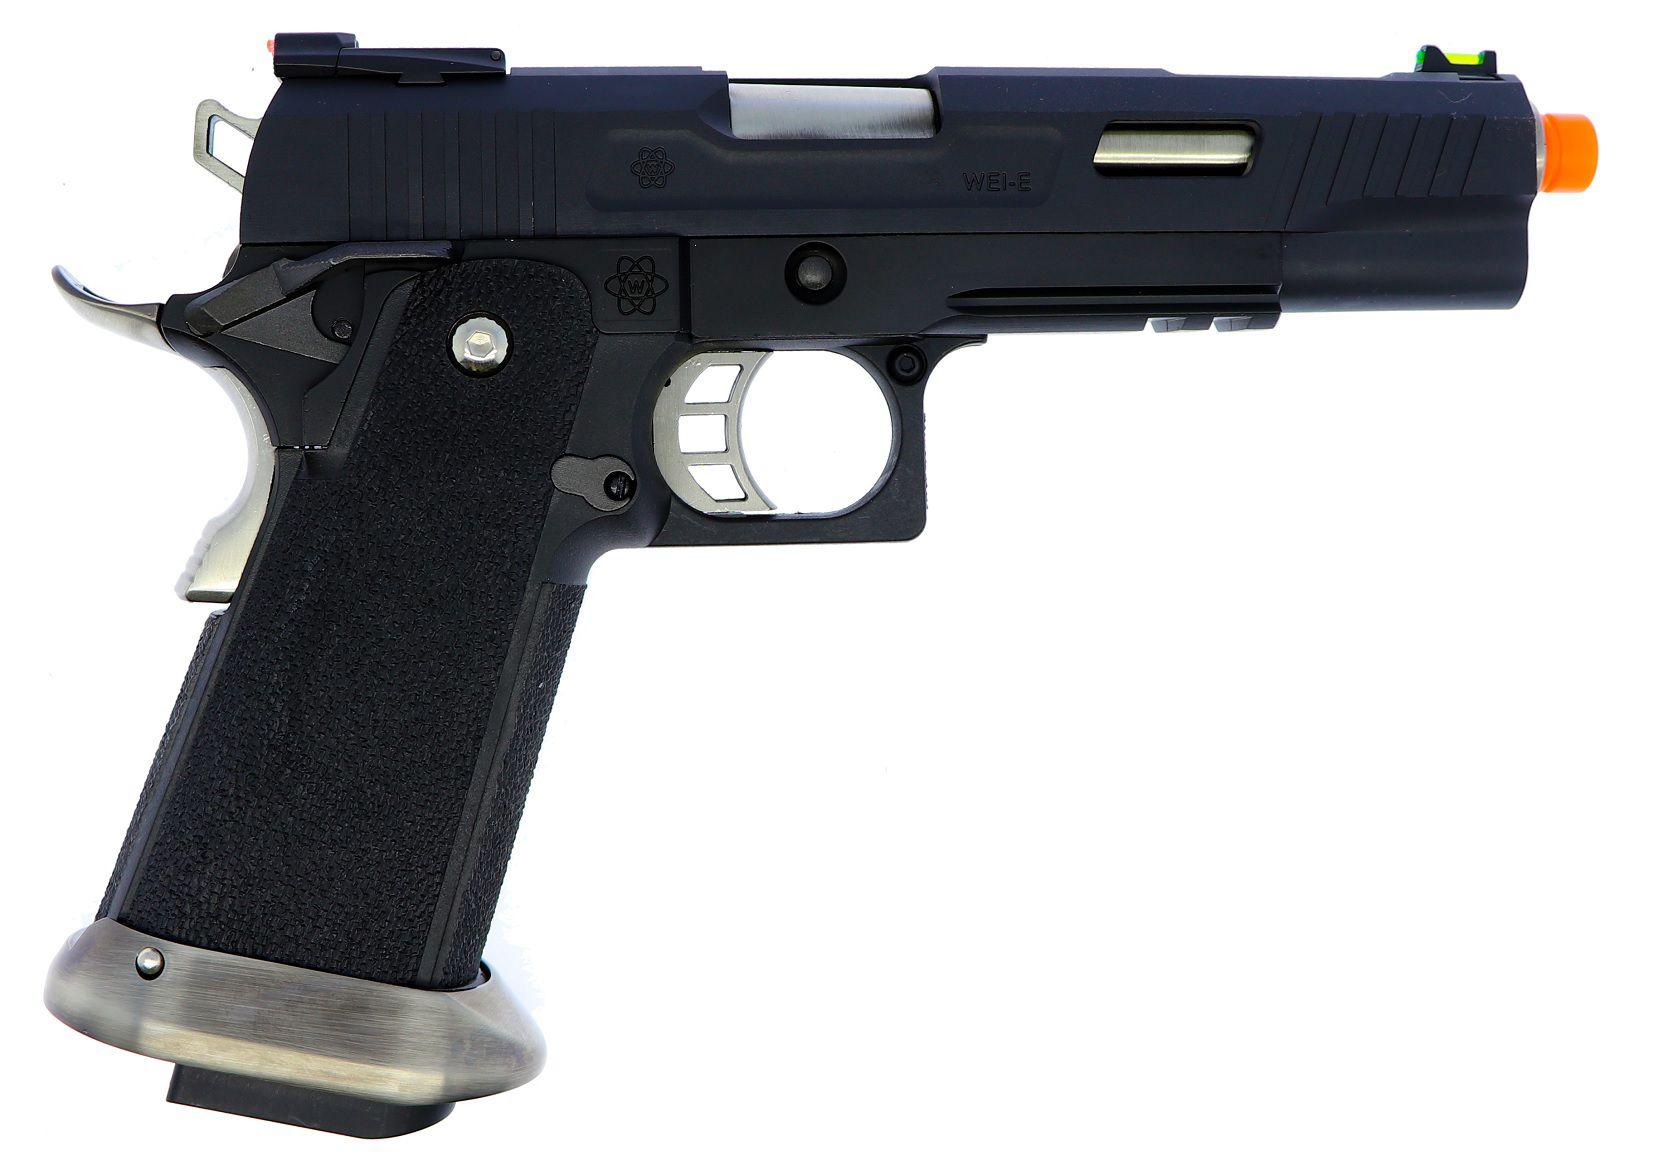 Pistola Airsoft WE Hicapa 5.1 Black (T-Rex)